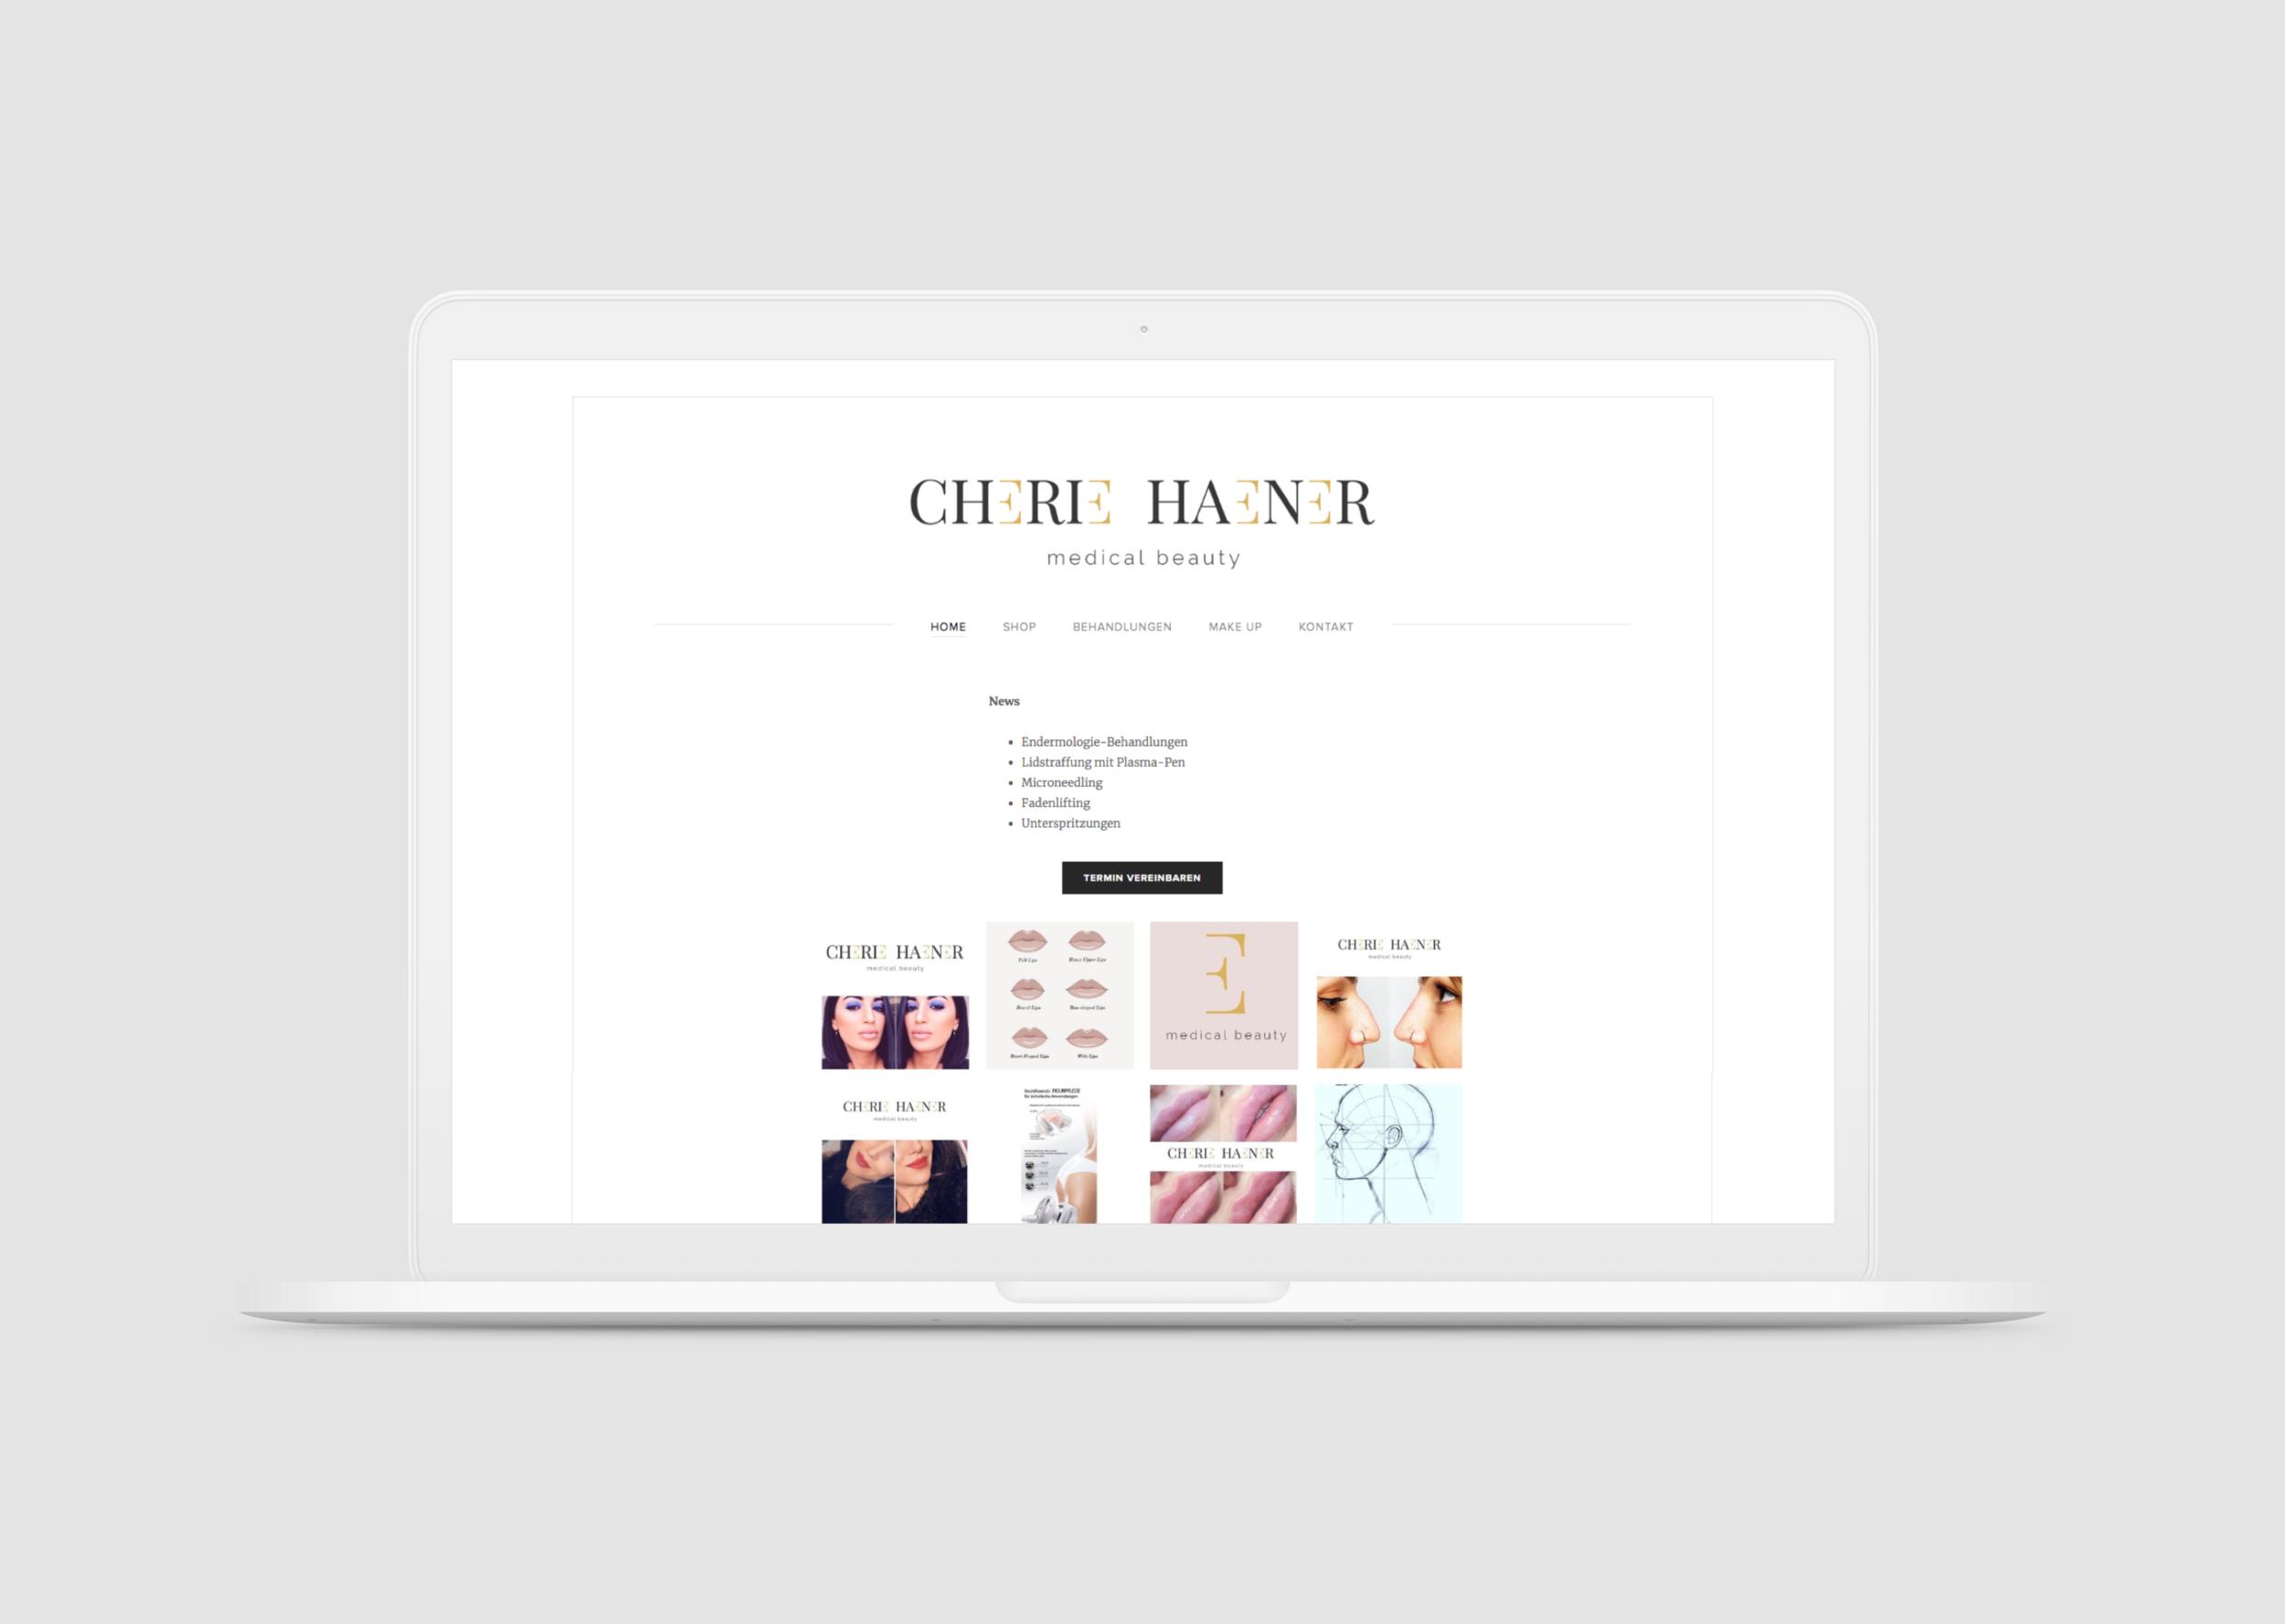 Website_CherieHaener.png